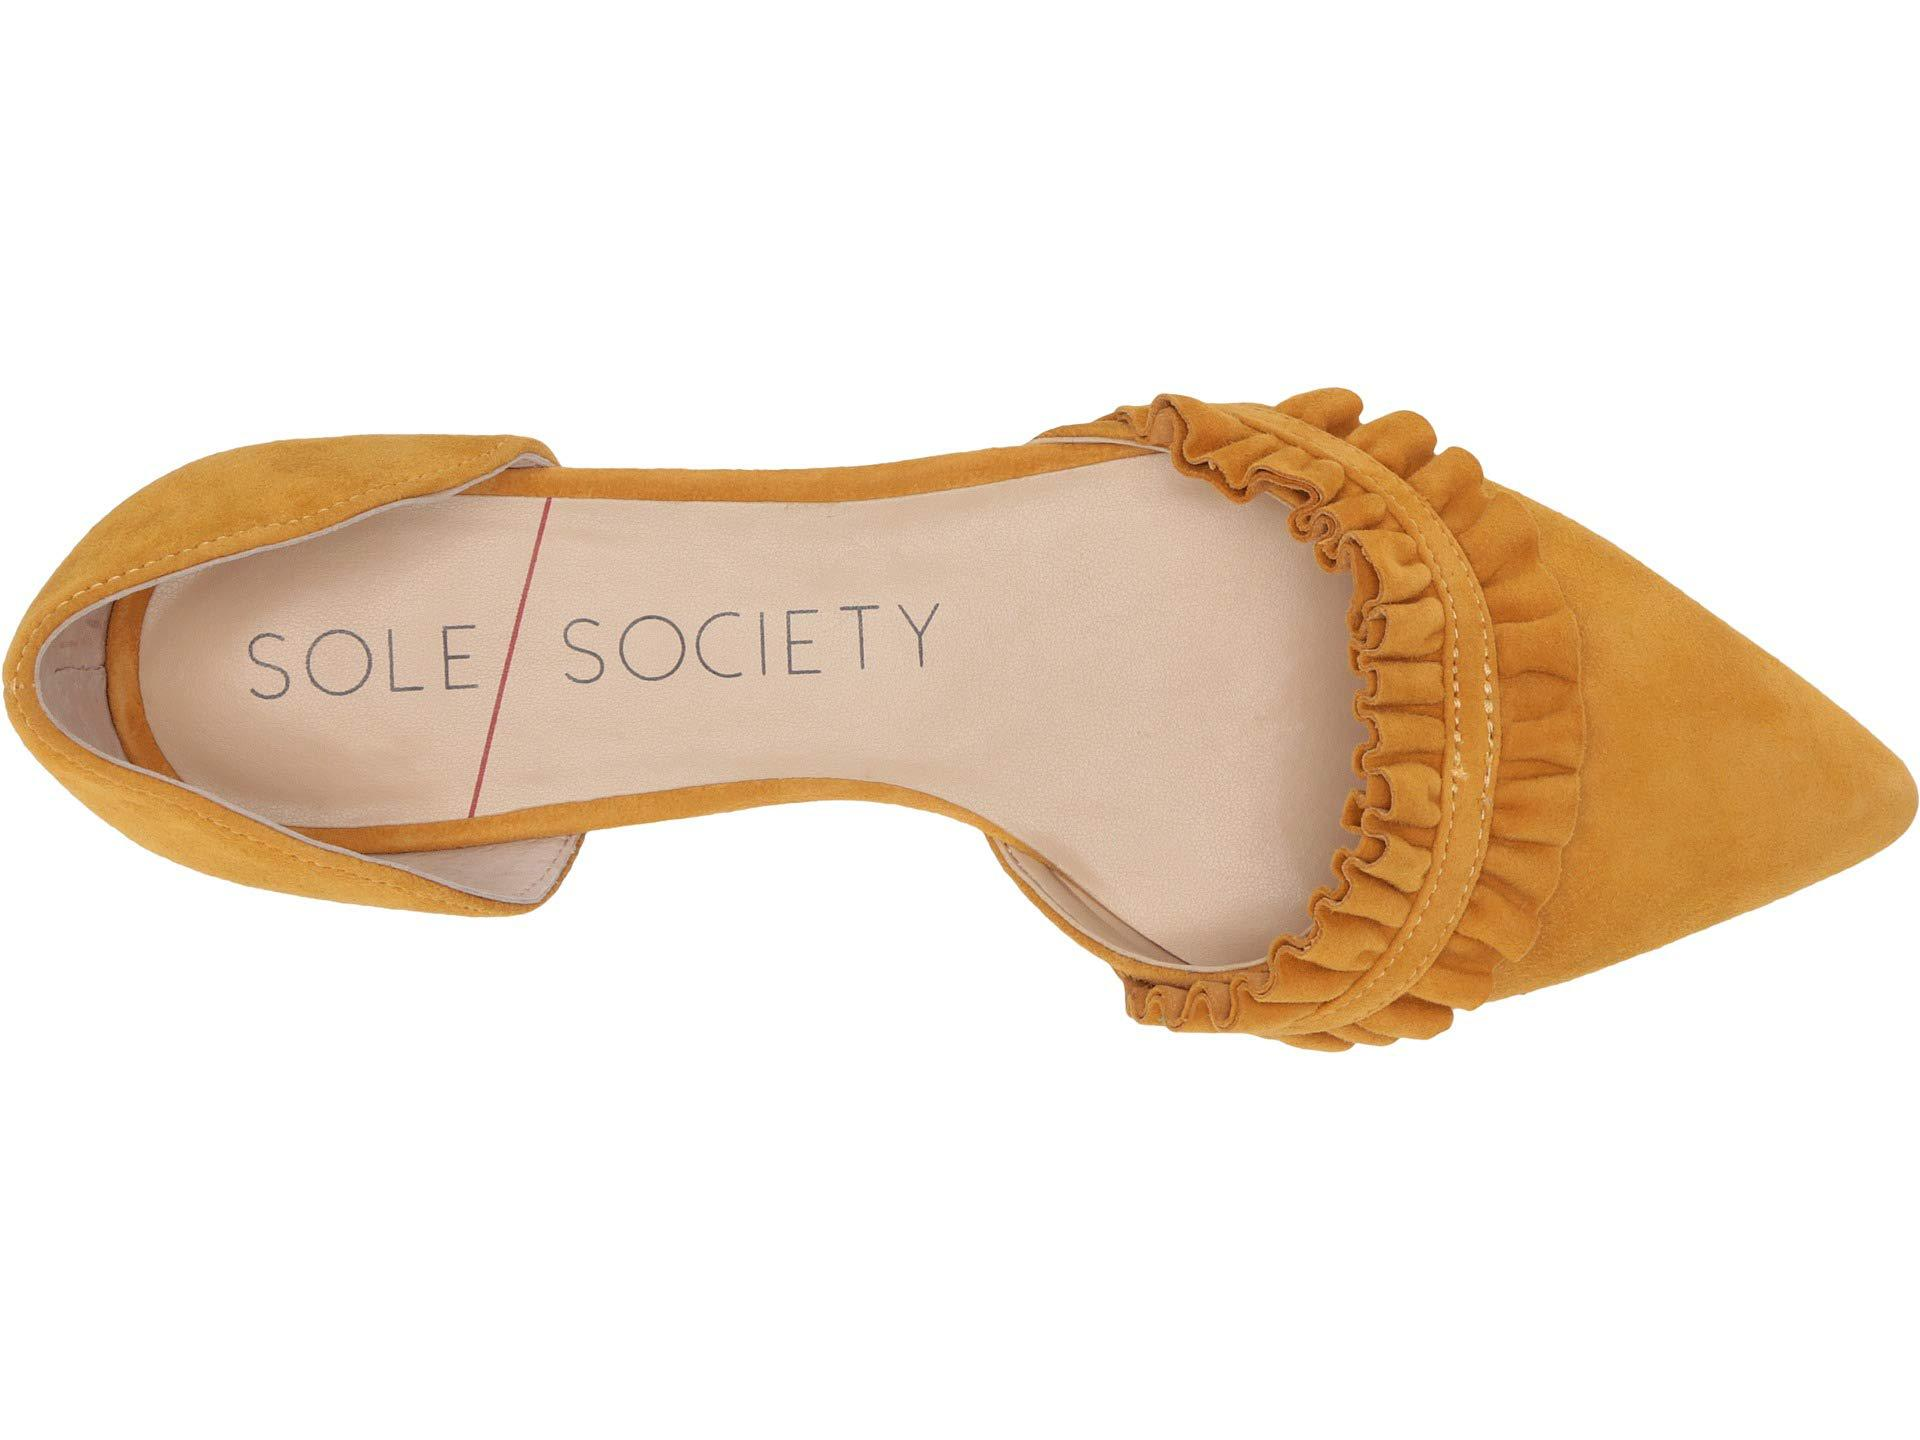 8852e4e90b92 Lyst - Sole Society Rosalind (mushroom Kid Suede) Women's Flat Shoes